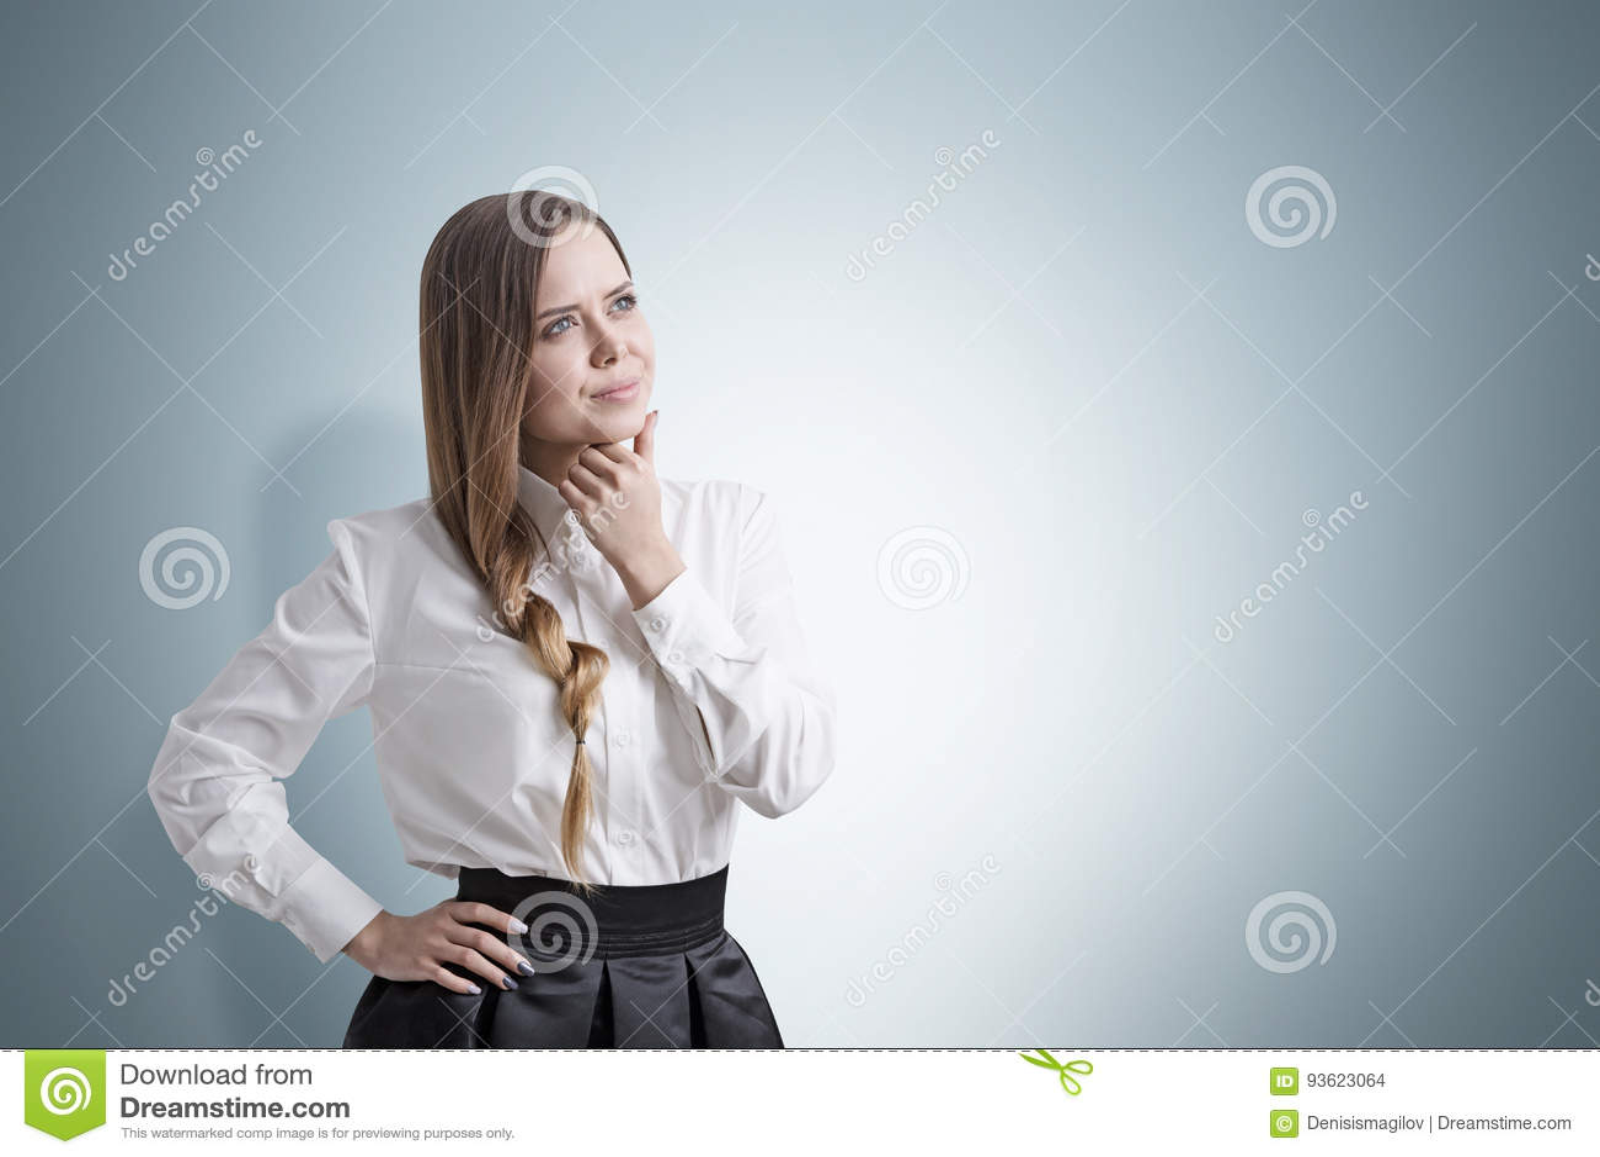 Portrait of businesswoman with a braid